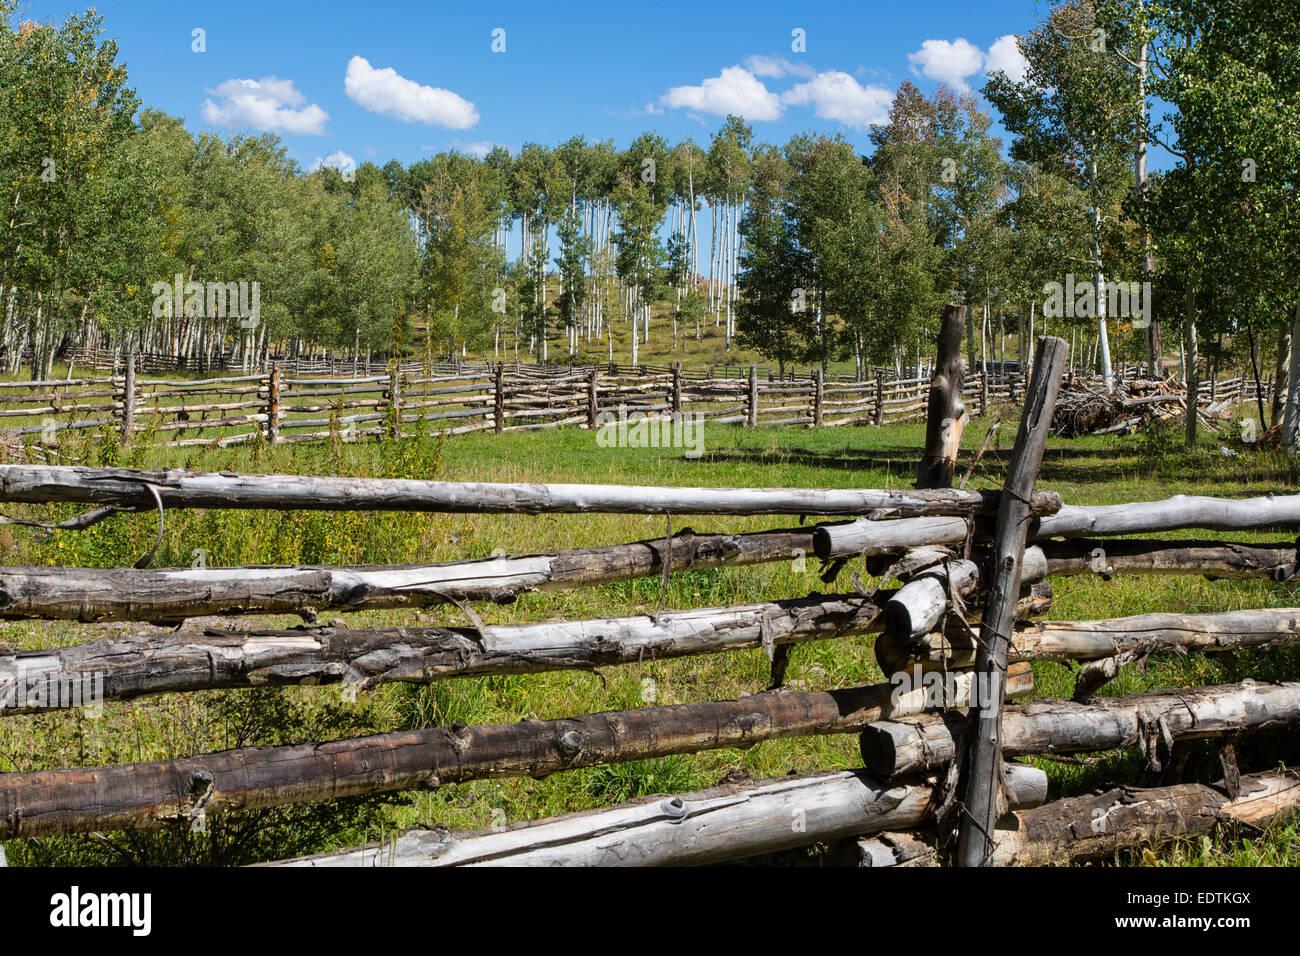 Fences along County Rt 5 outside Ridgeway Colorado - Stock Image